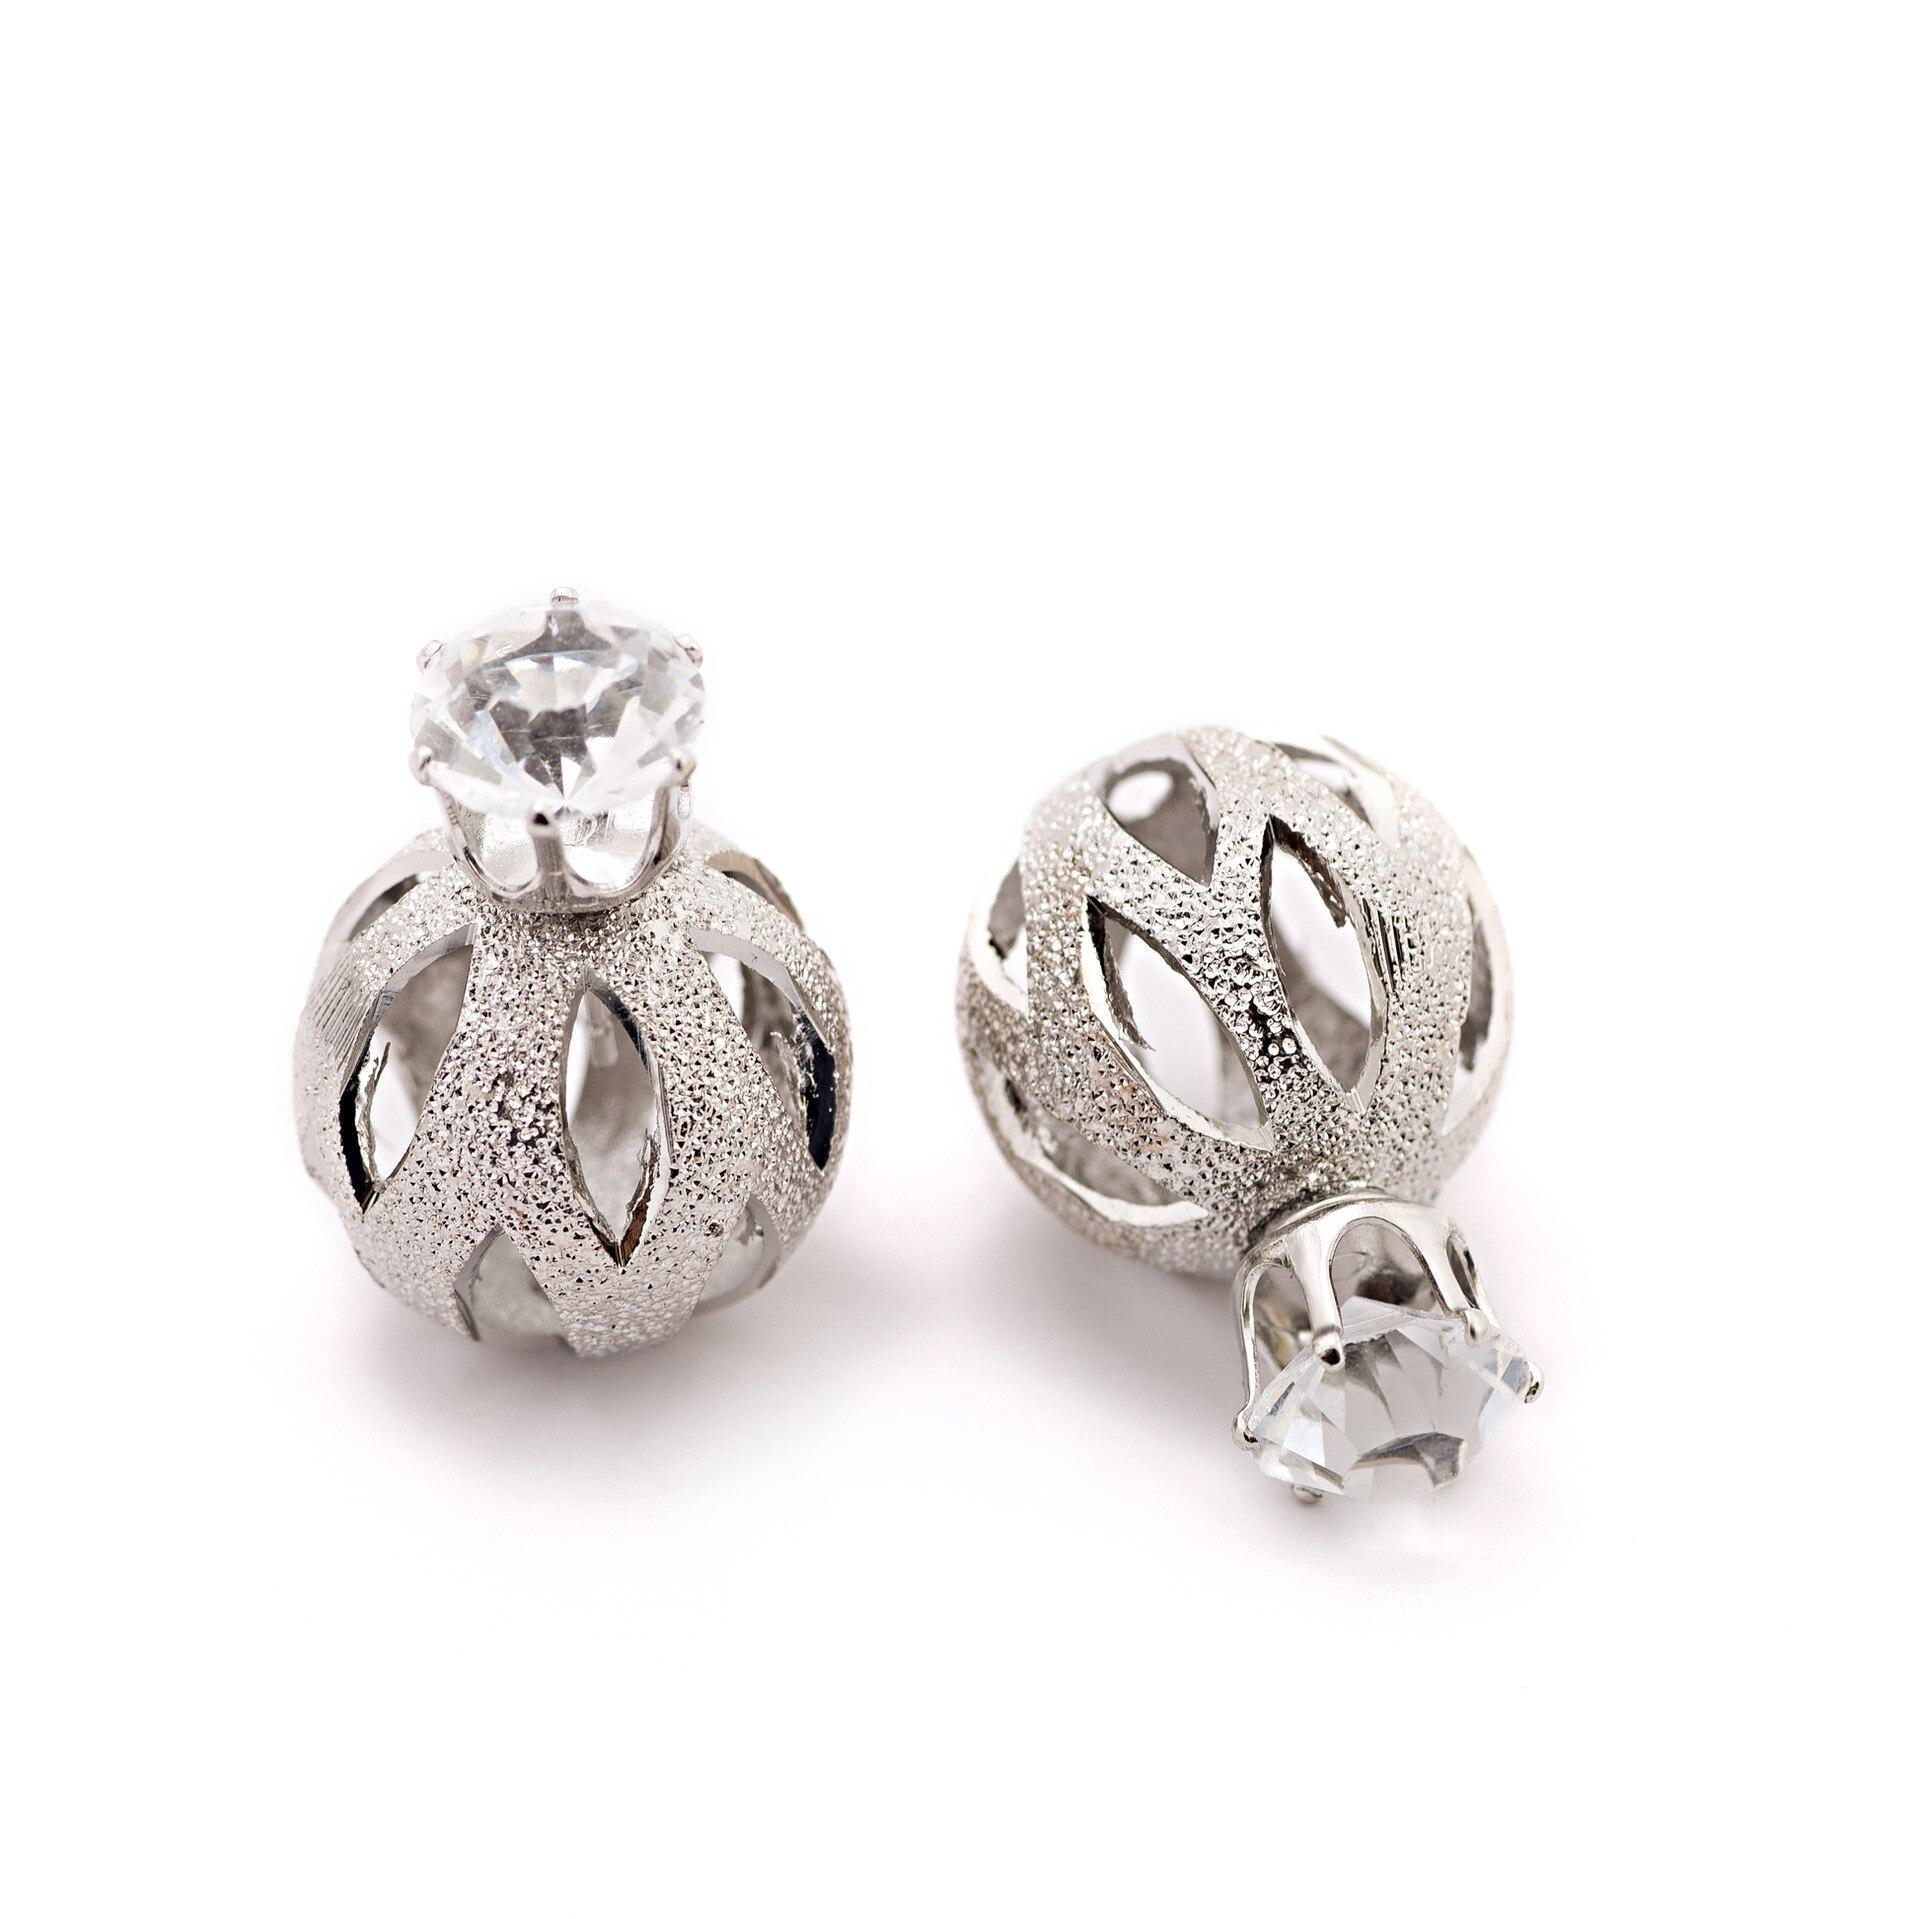 Cheap Pandora Earrings: Popular Pandora Earring-Buy Cheap Pandora Earring Lots